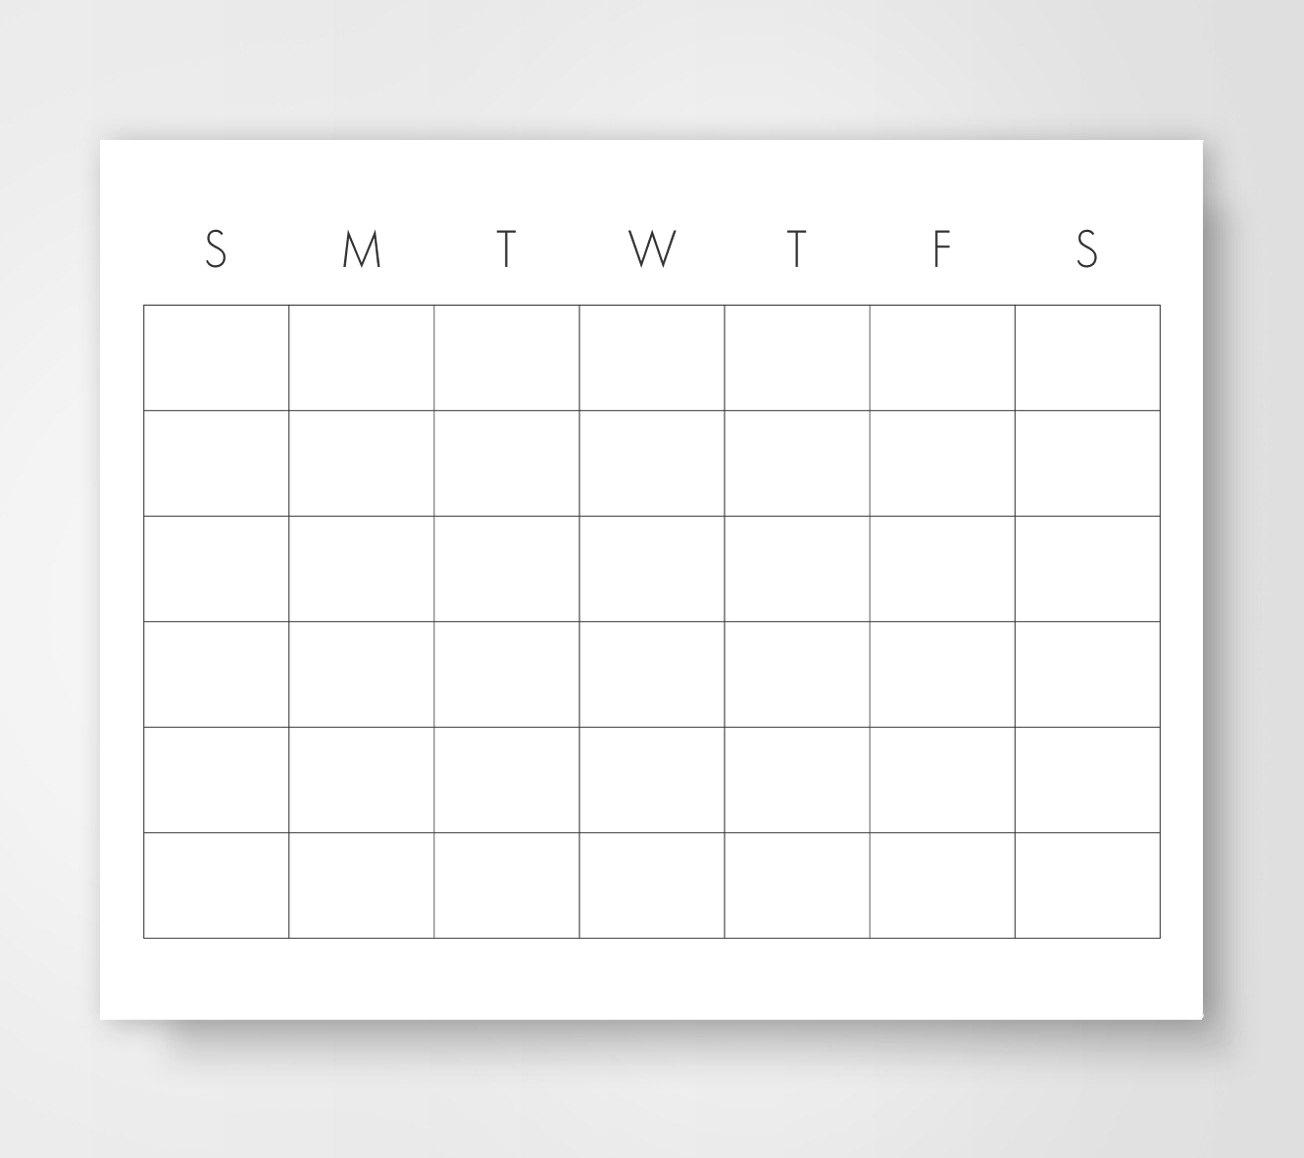 Printable Calendar 8 X 11 :Free Calendar Template for 8X11 Calendar Printable